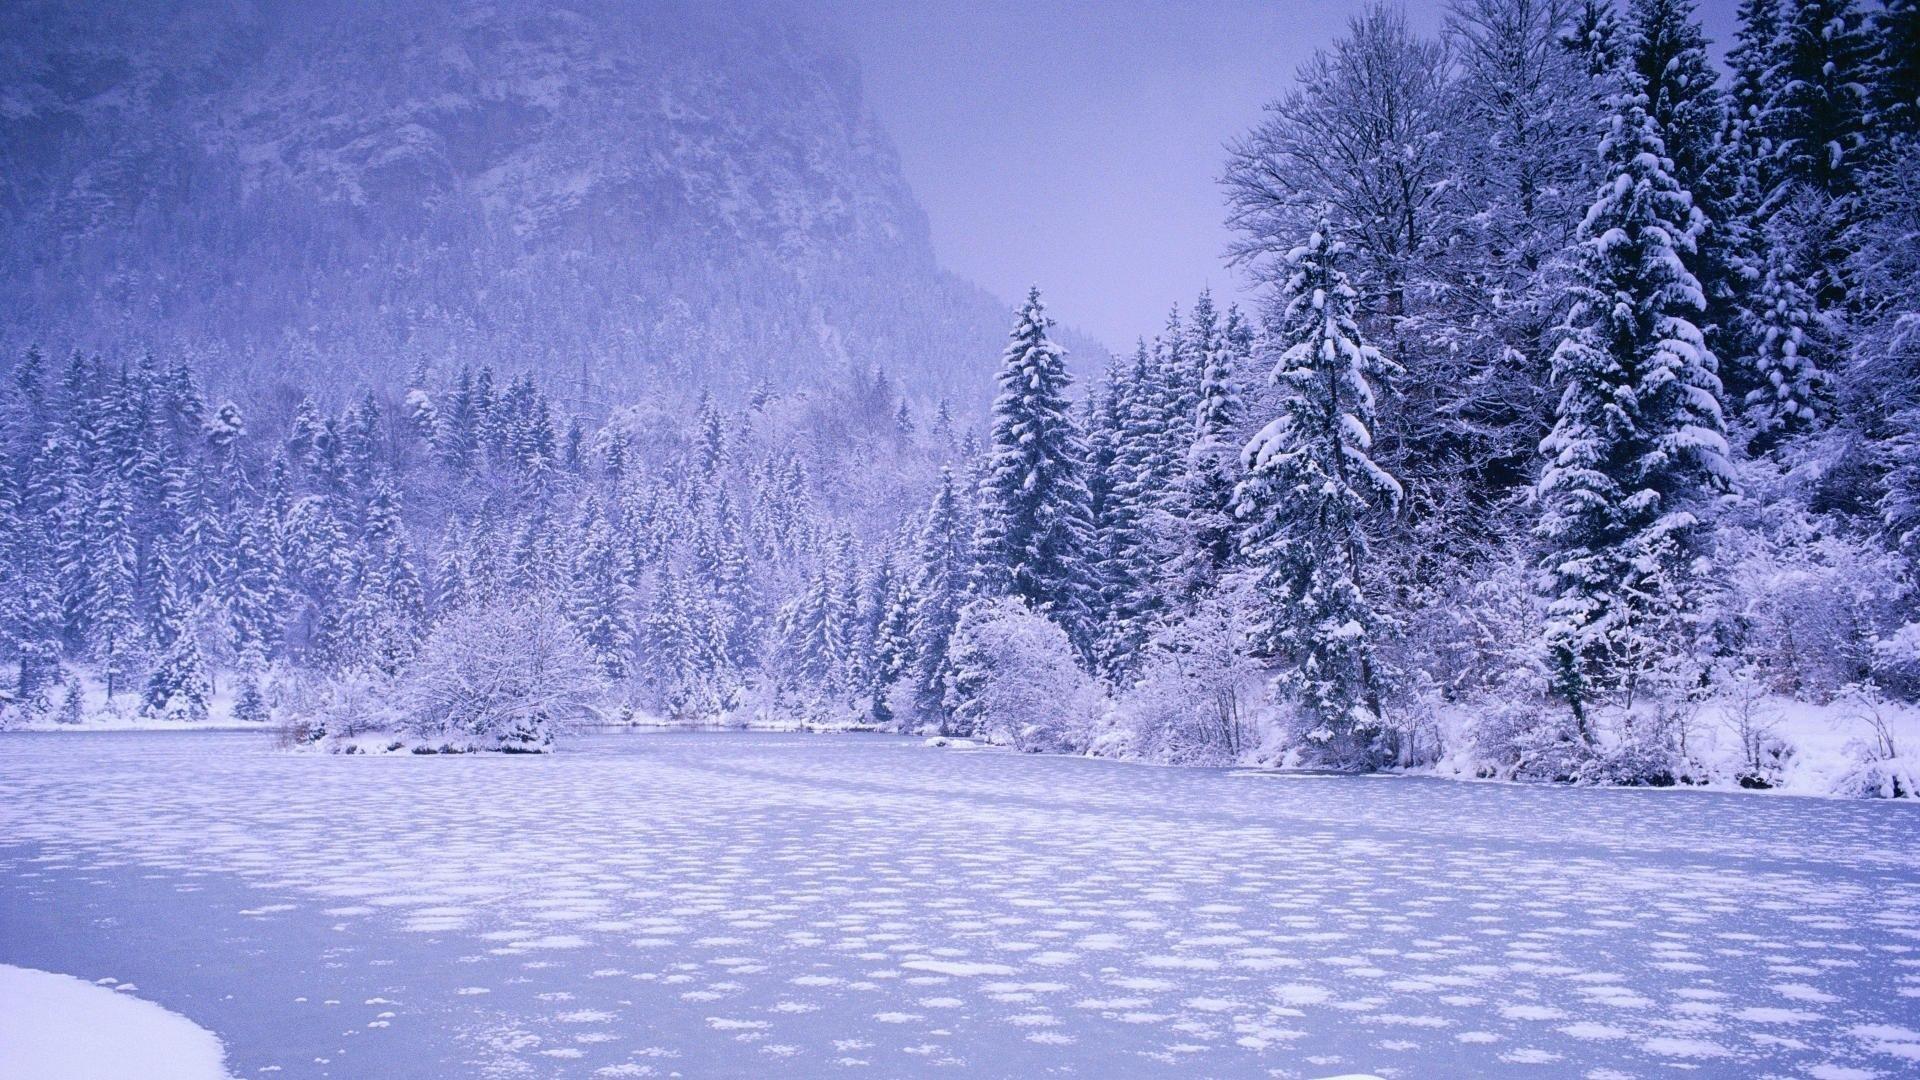 Nature Winter Wallpapers Hd 1080p Wallpaper Nature - Beautiful Anime Winter Background - HD Wallpaper